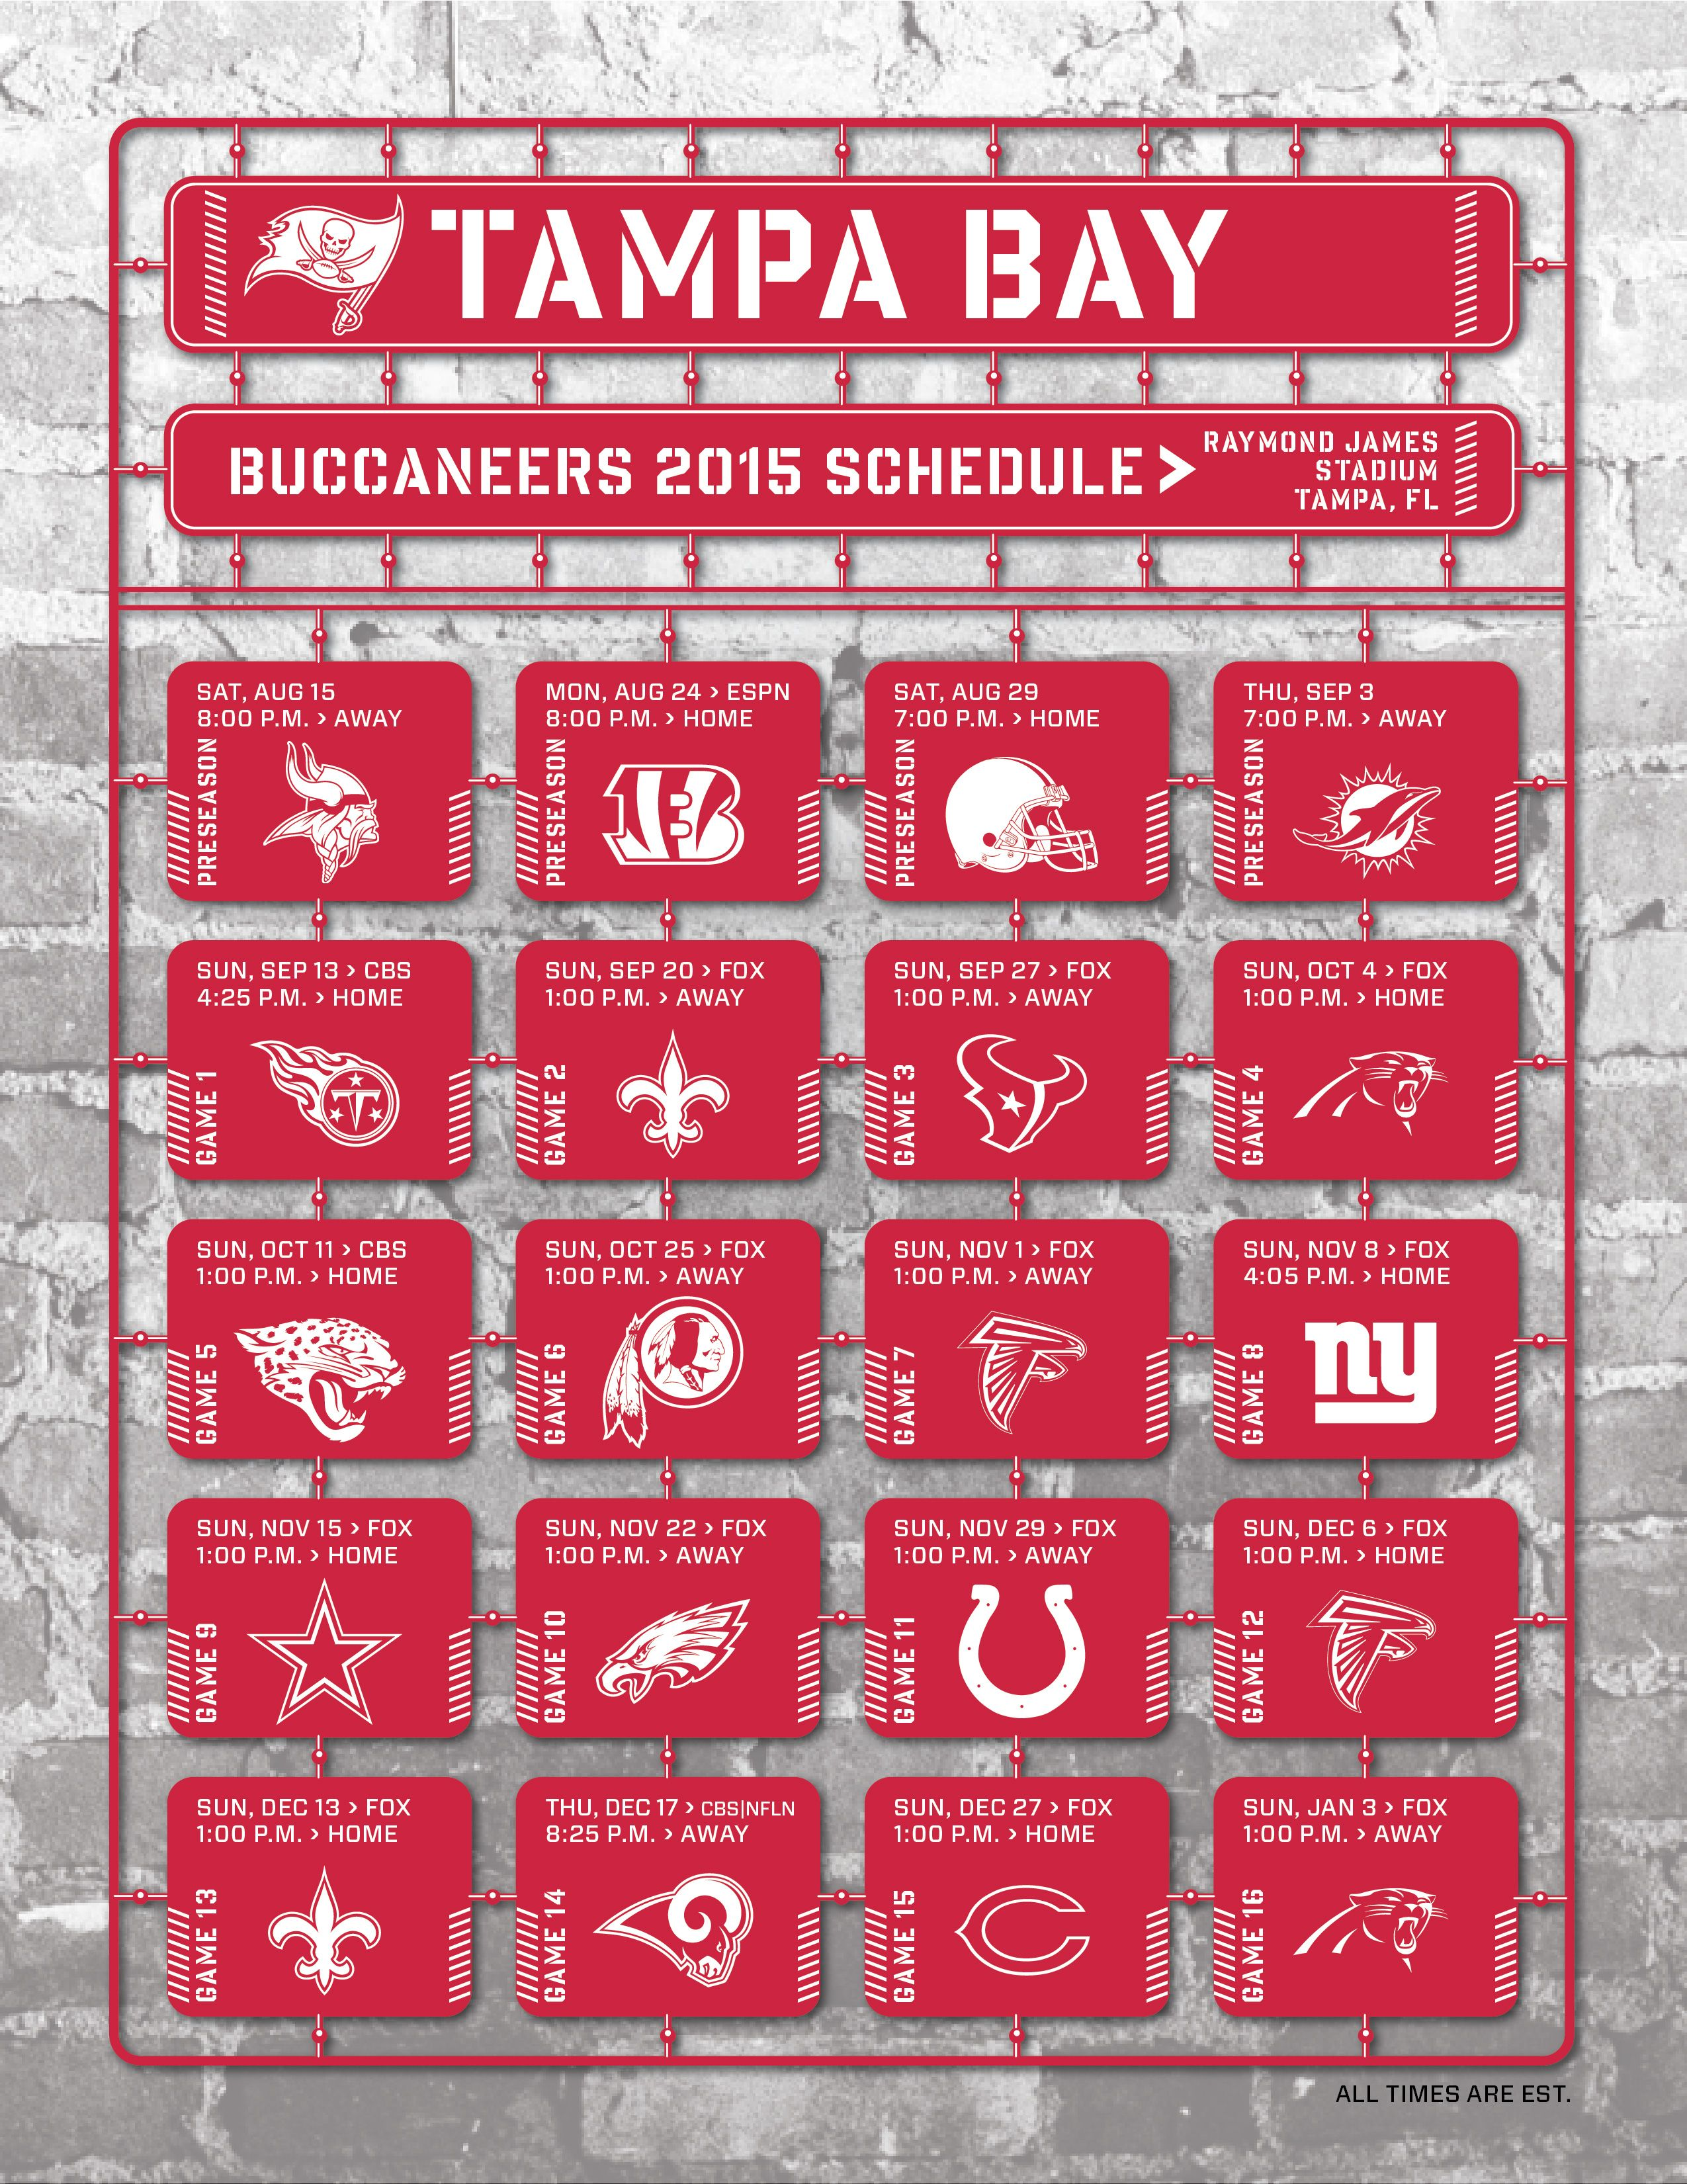 Tampa Bay Buccaneers 2015 Schedule Atlanta Falcons Schedule Atlanta Falcons San Francisco 49ers